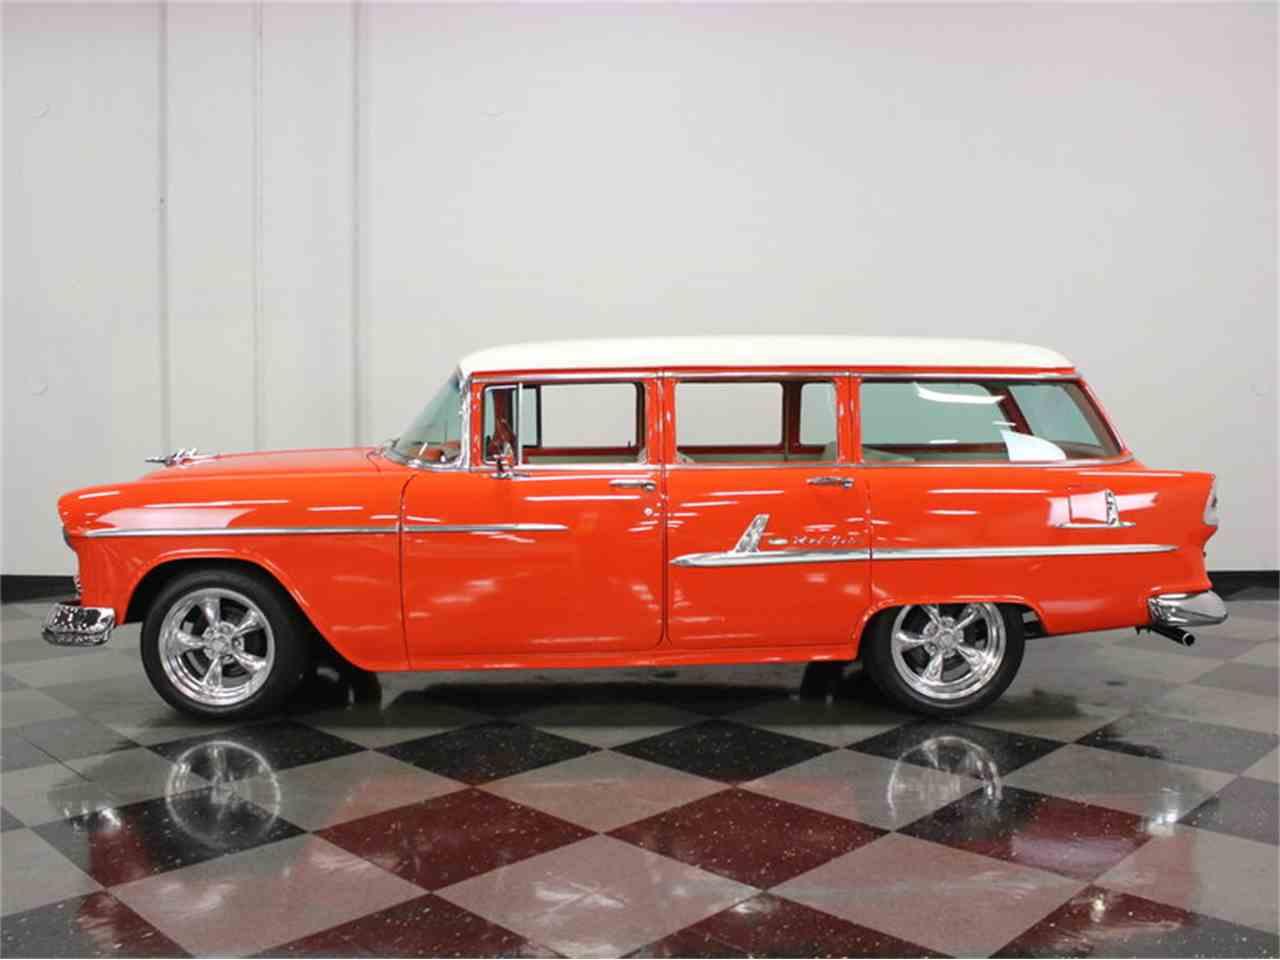 1955 Chevrolet Bel Air Wagon for Sale | ClassicCars.com | CC-943371